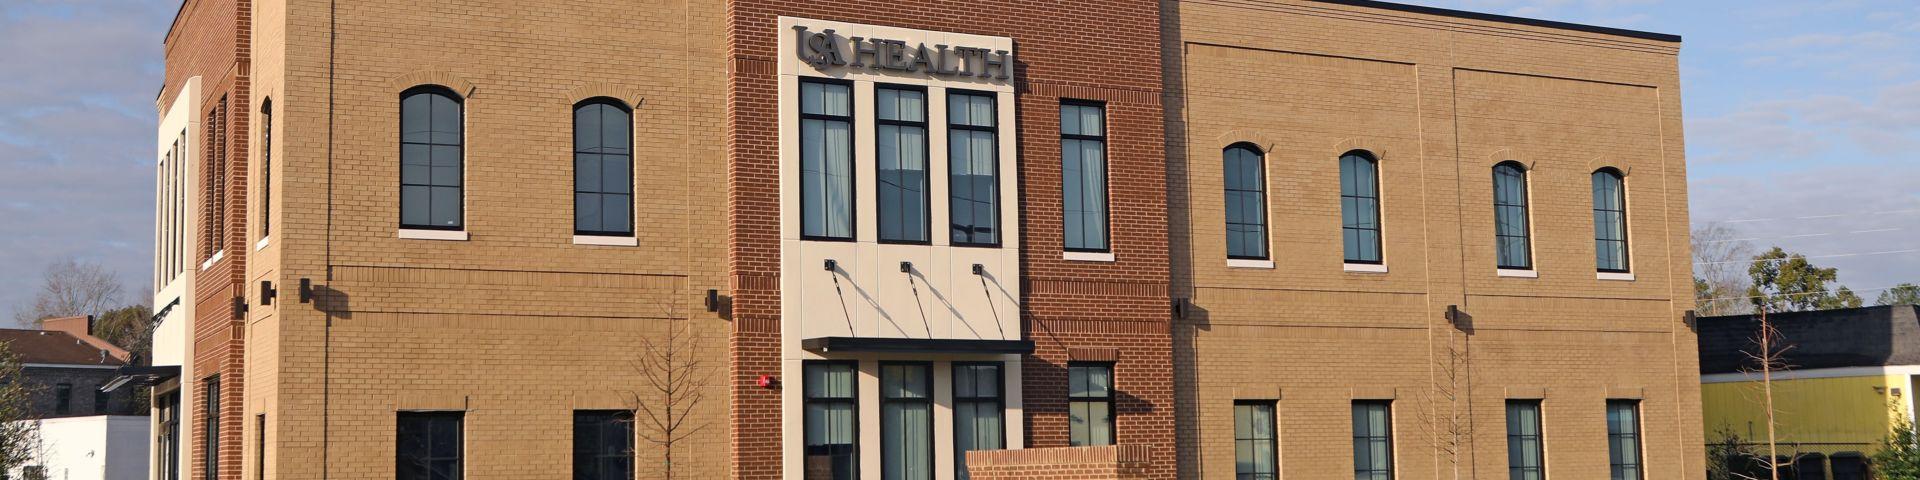 Midtown clinic